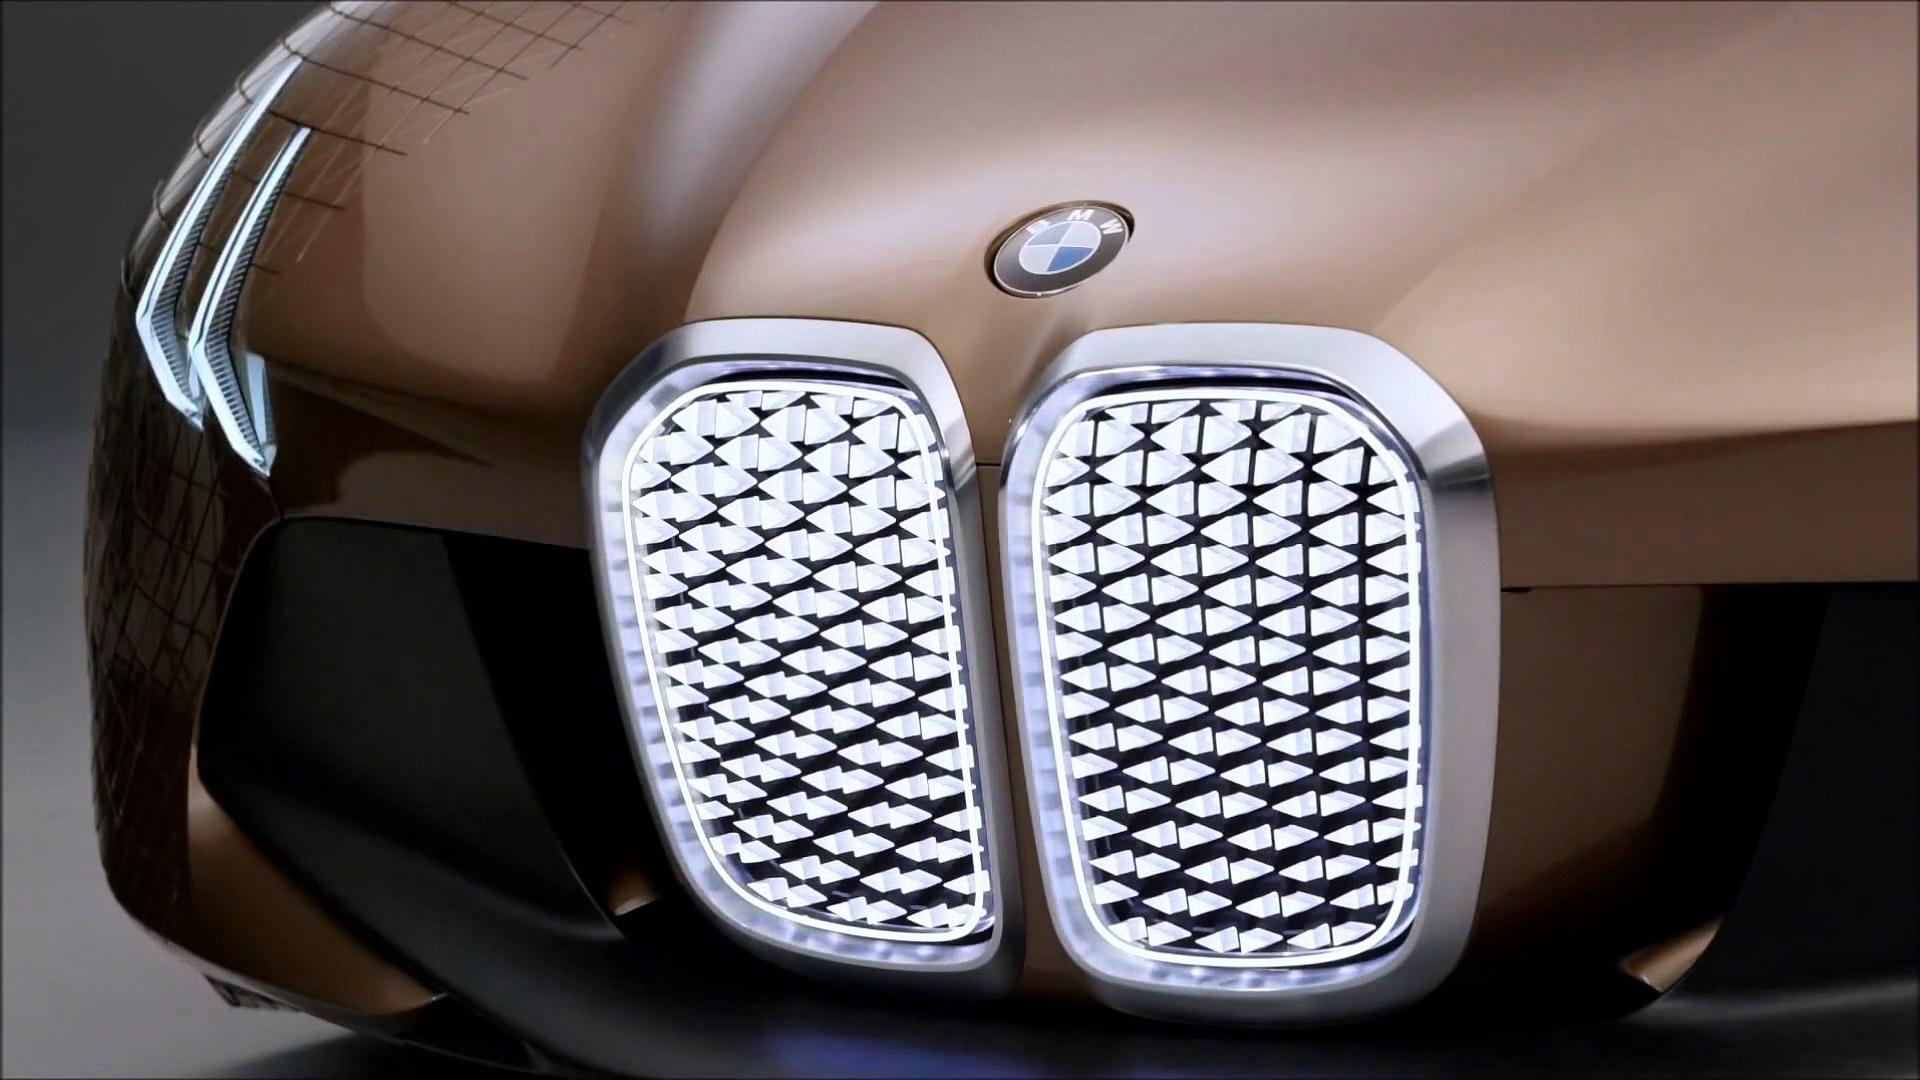 NEW TECHNOLOGY Bmw Vision Next 100 Advanced Technology Car